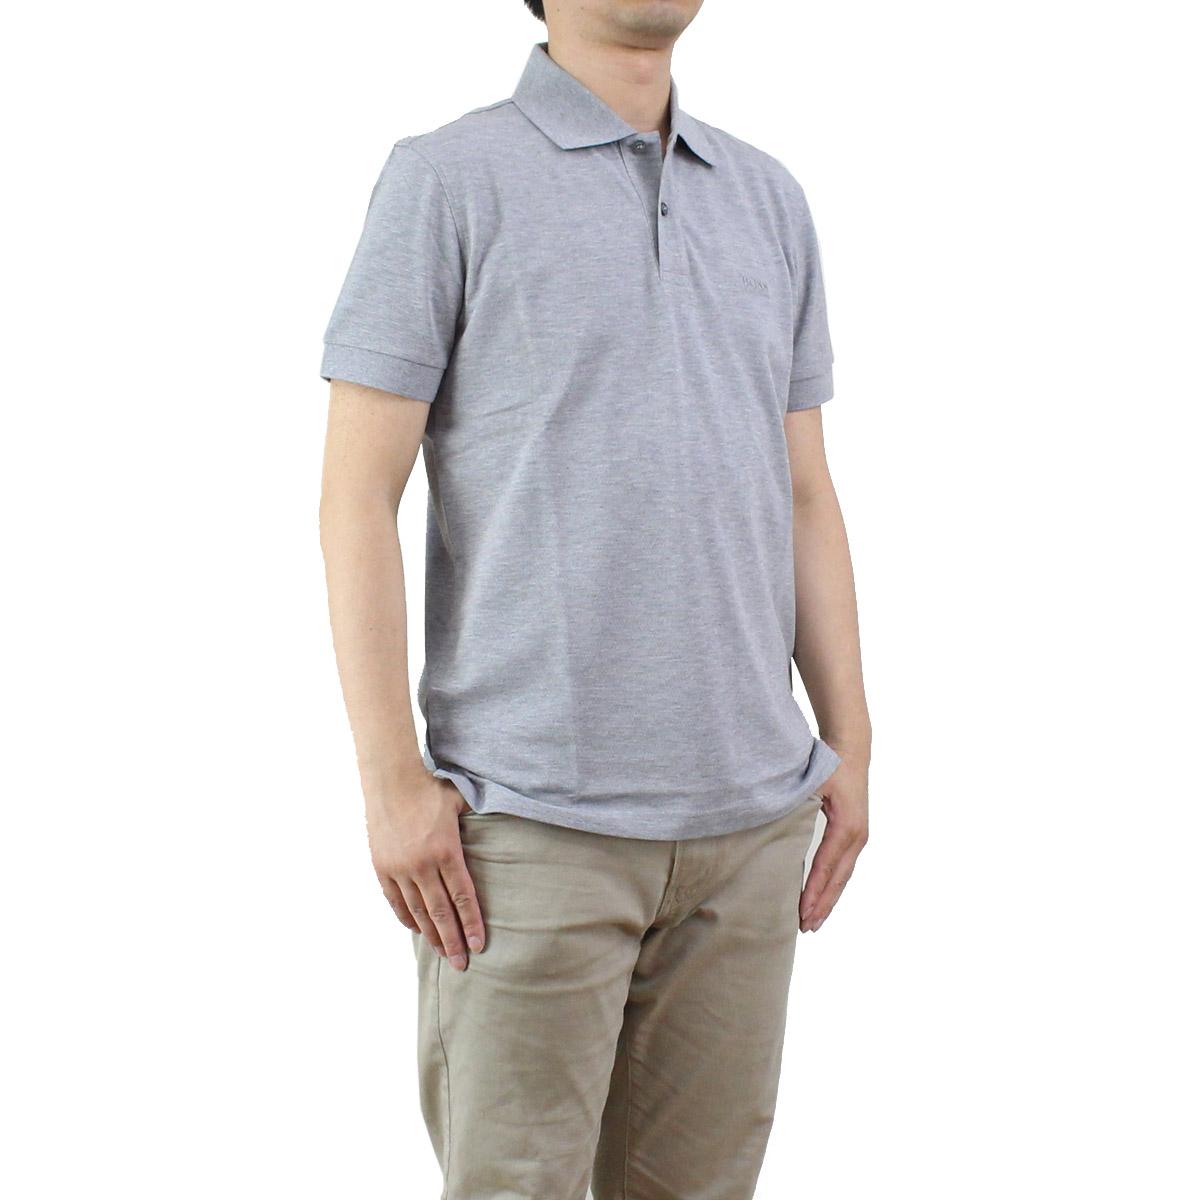 a4f04381 Bighit The total brand wholesale: Hugo boss (HUGO BOSS) C-FIRENZE/LOGO C-  Florence men polo shirt 50292333 10108581 059 gray system (golf wear) |  Rakuten ...